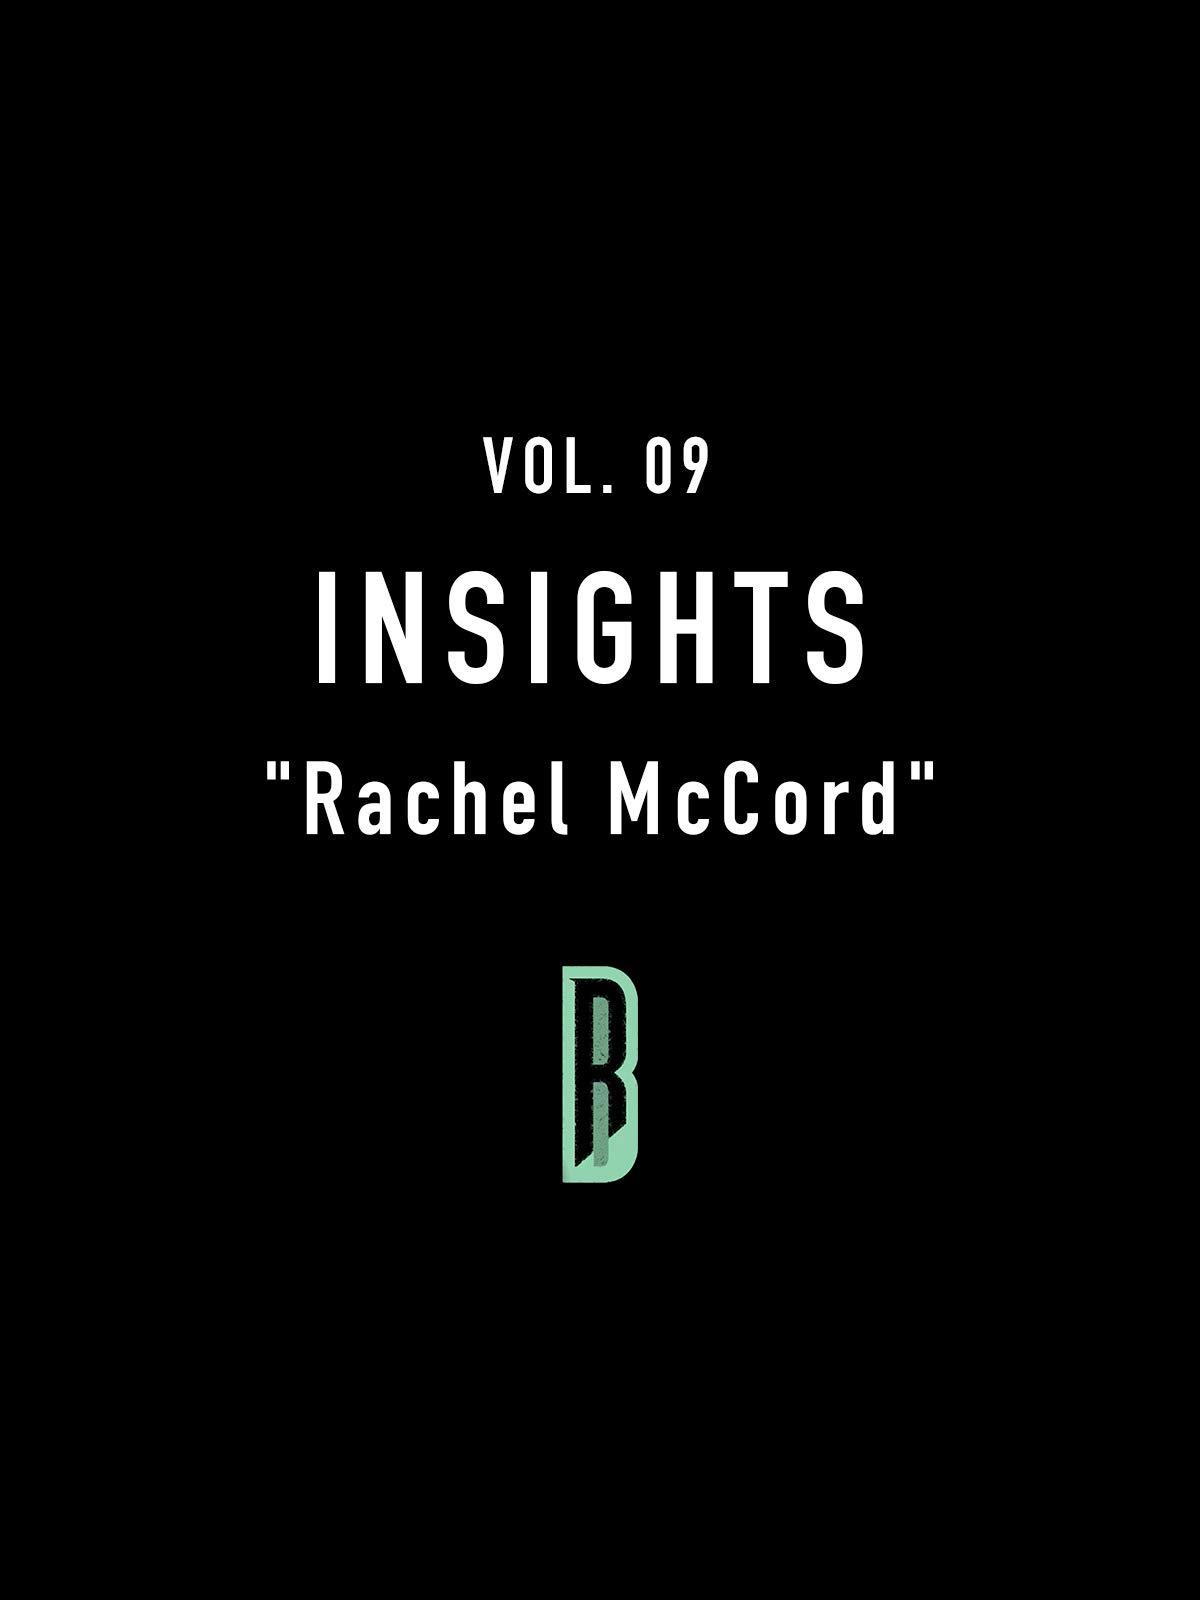 Insights Vol. 09